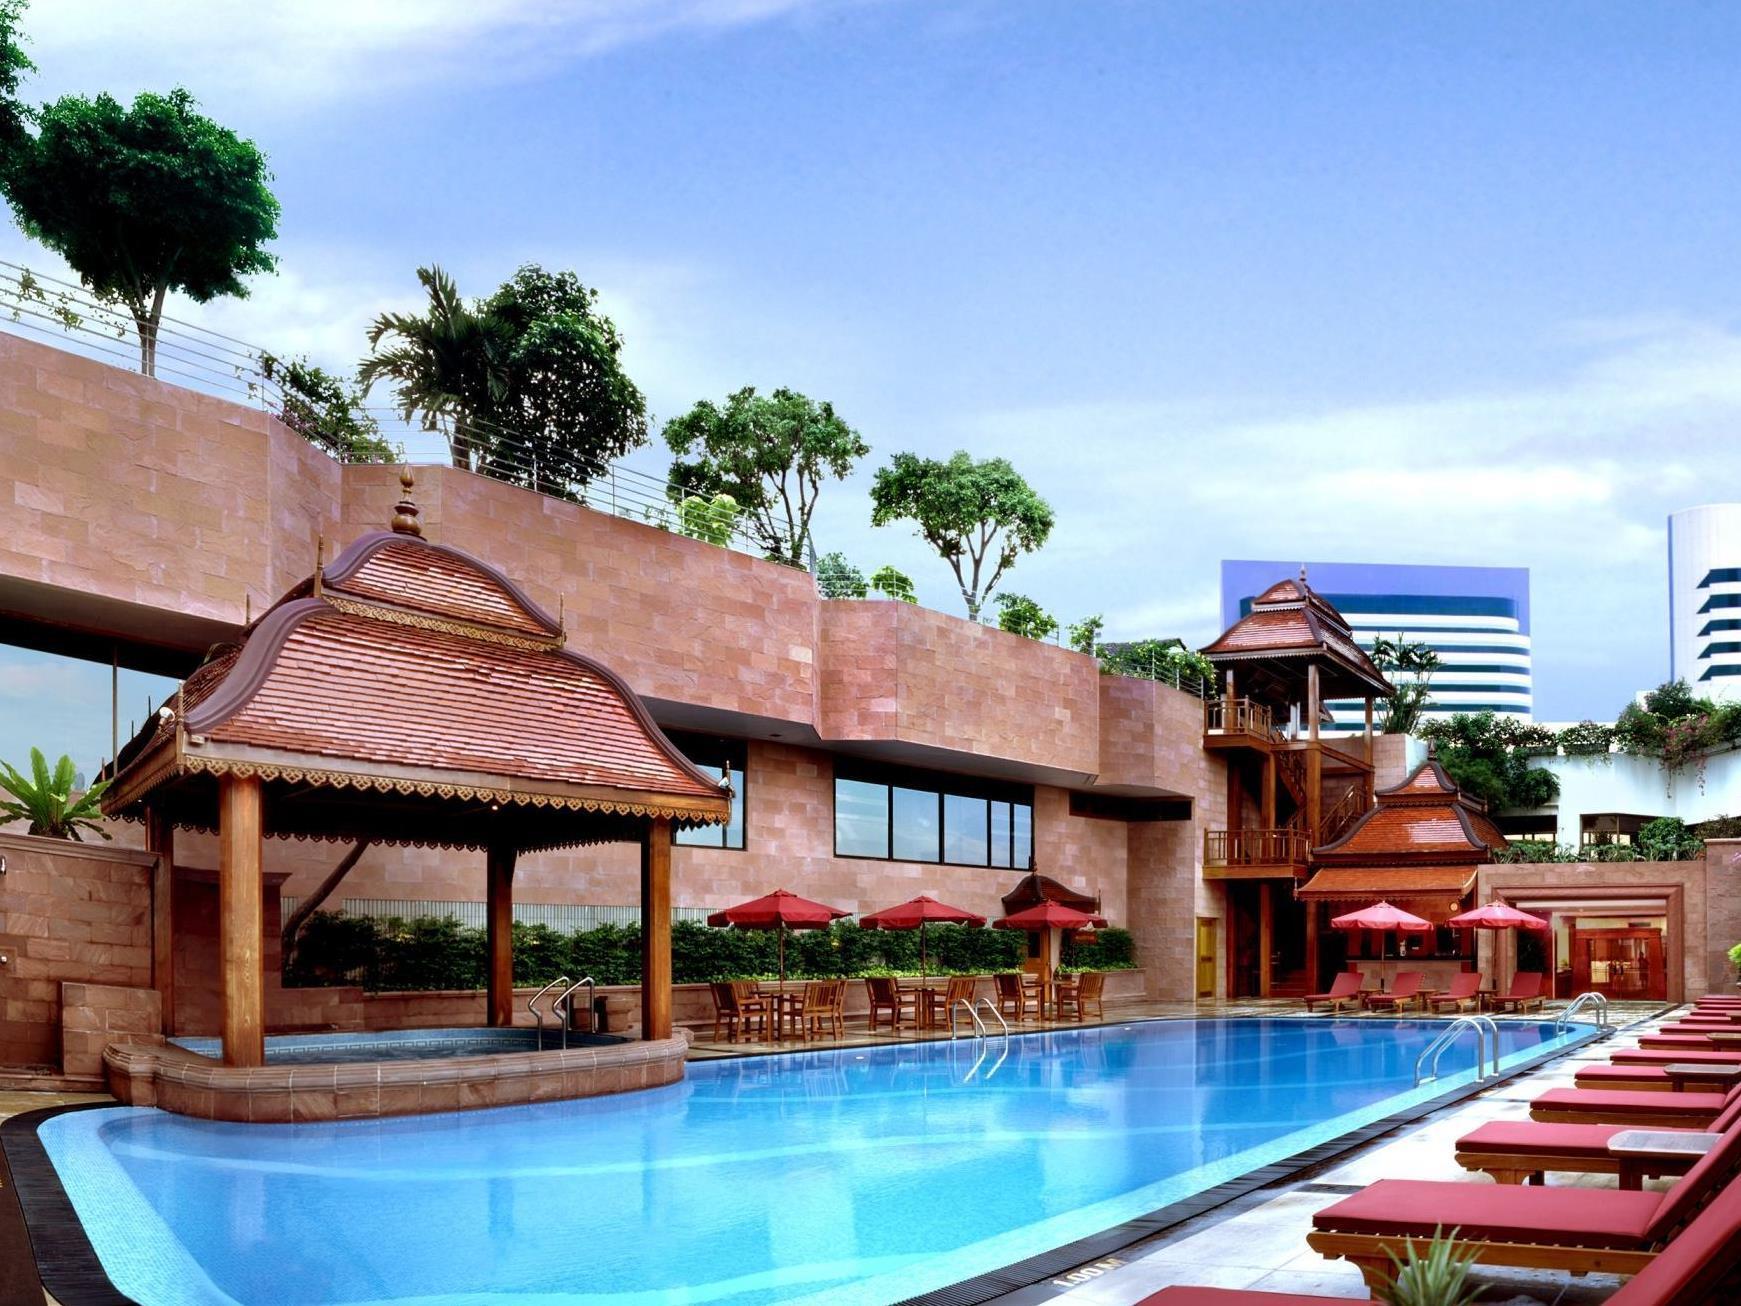 The landmark hotel bangkok bangkok for Trouver une hotel